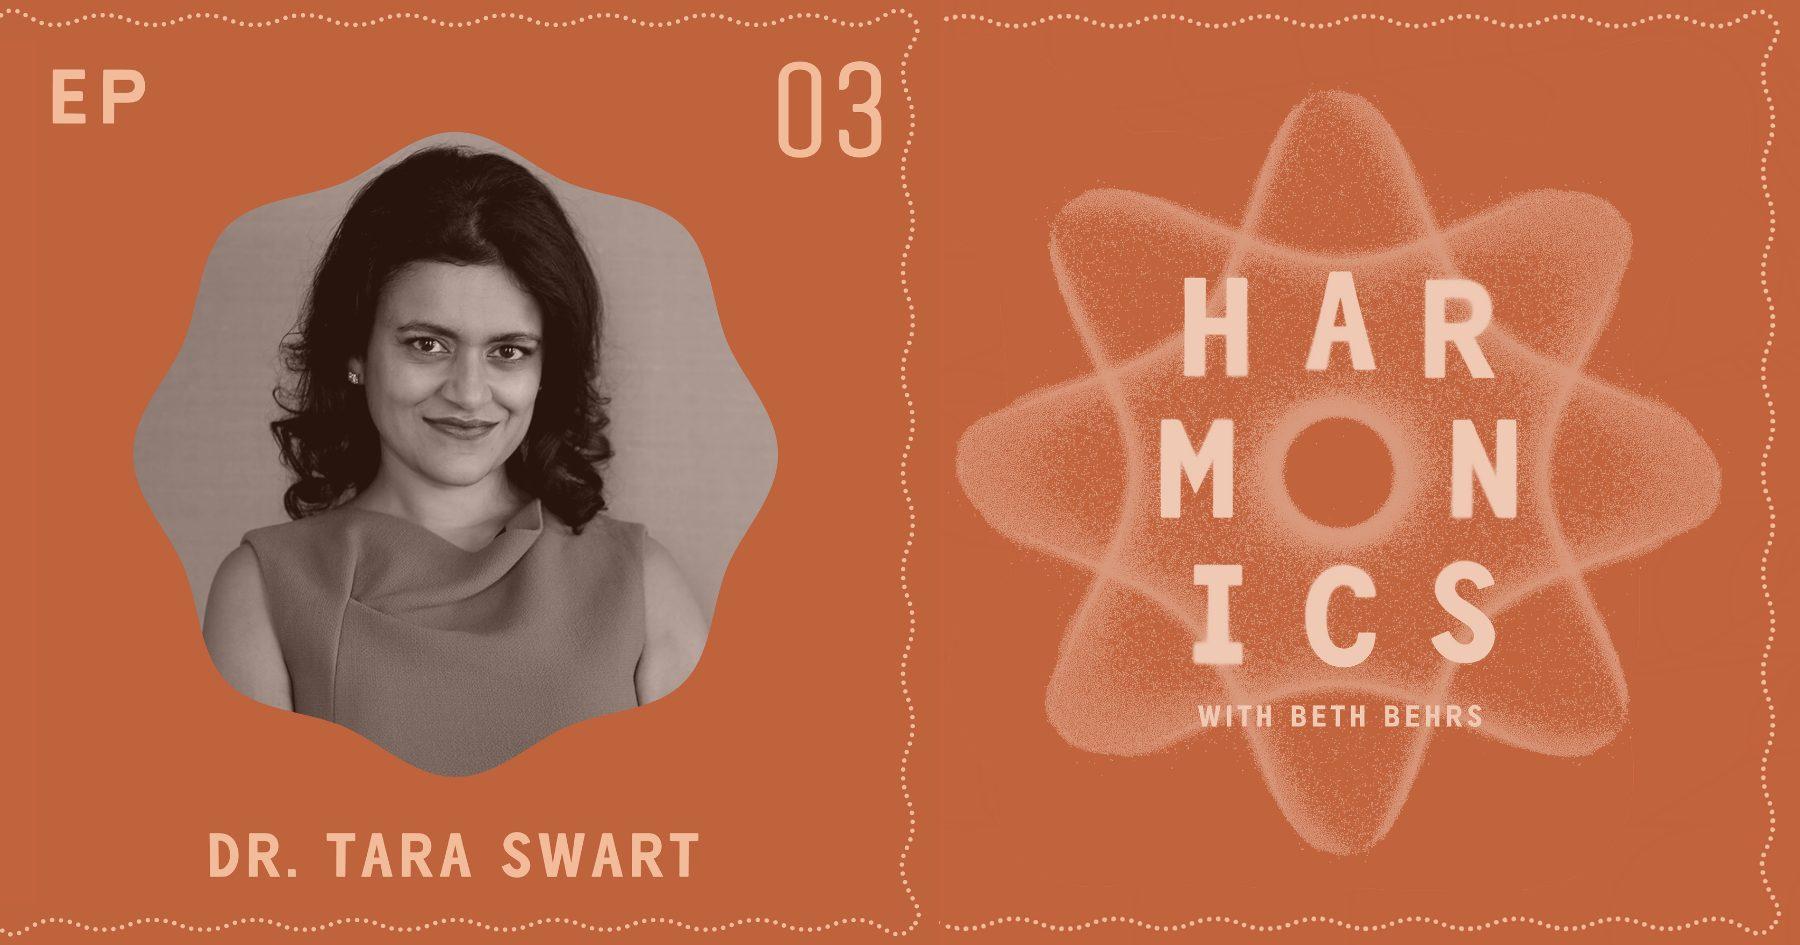 Harmonics with Beth Behrs: Dr. Tara Swart